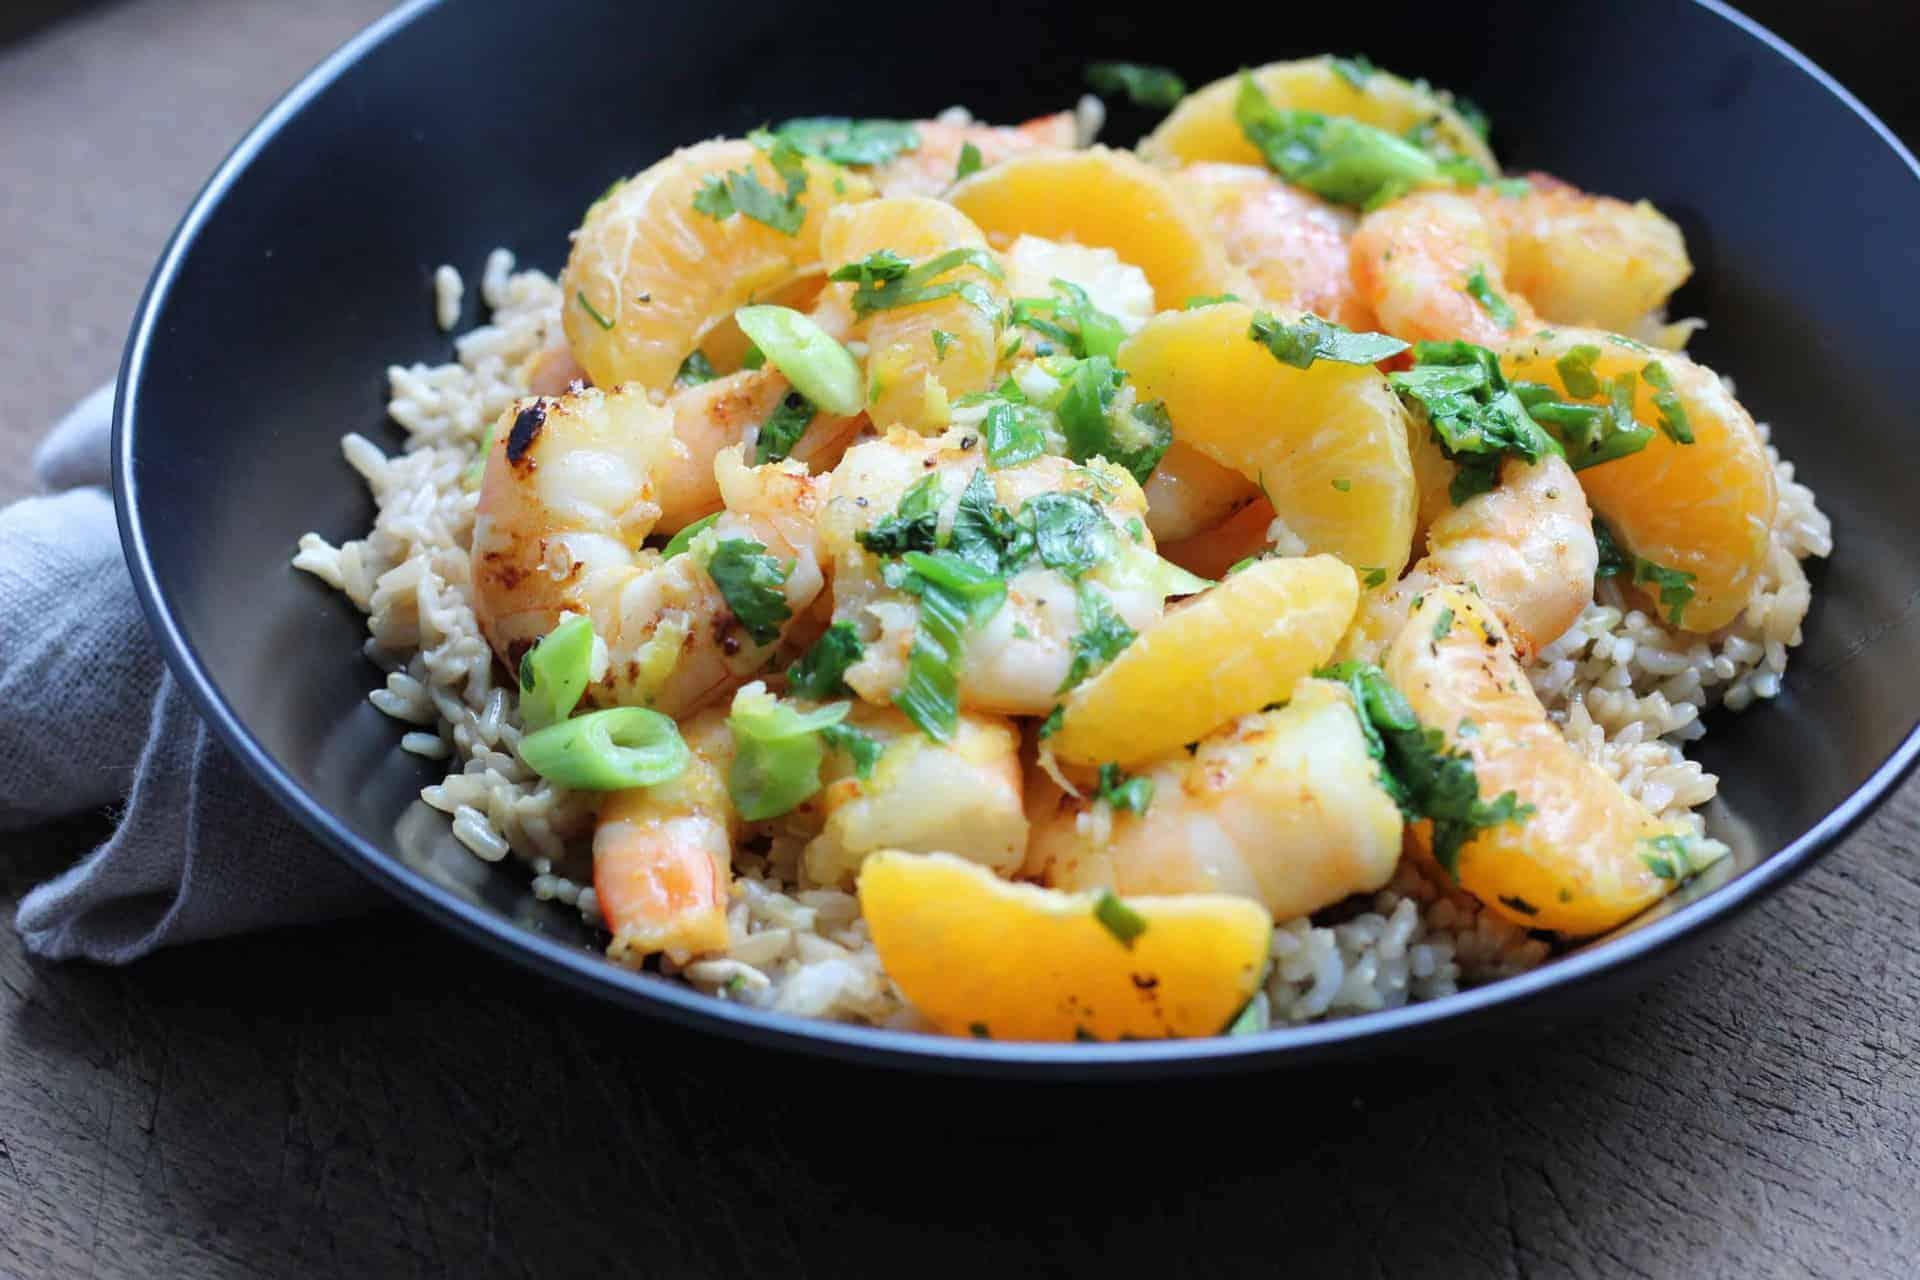 Shrimp, Seafood, Dinner, Omega-3s, Quick & Easy, Winter